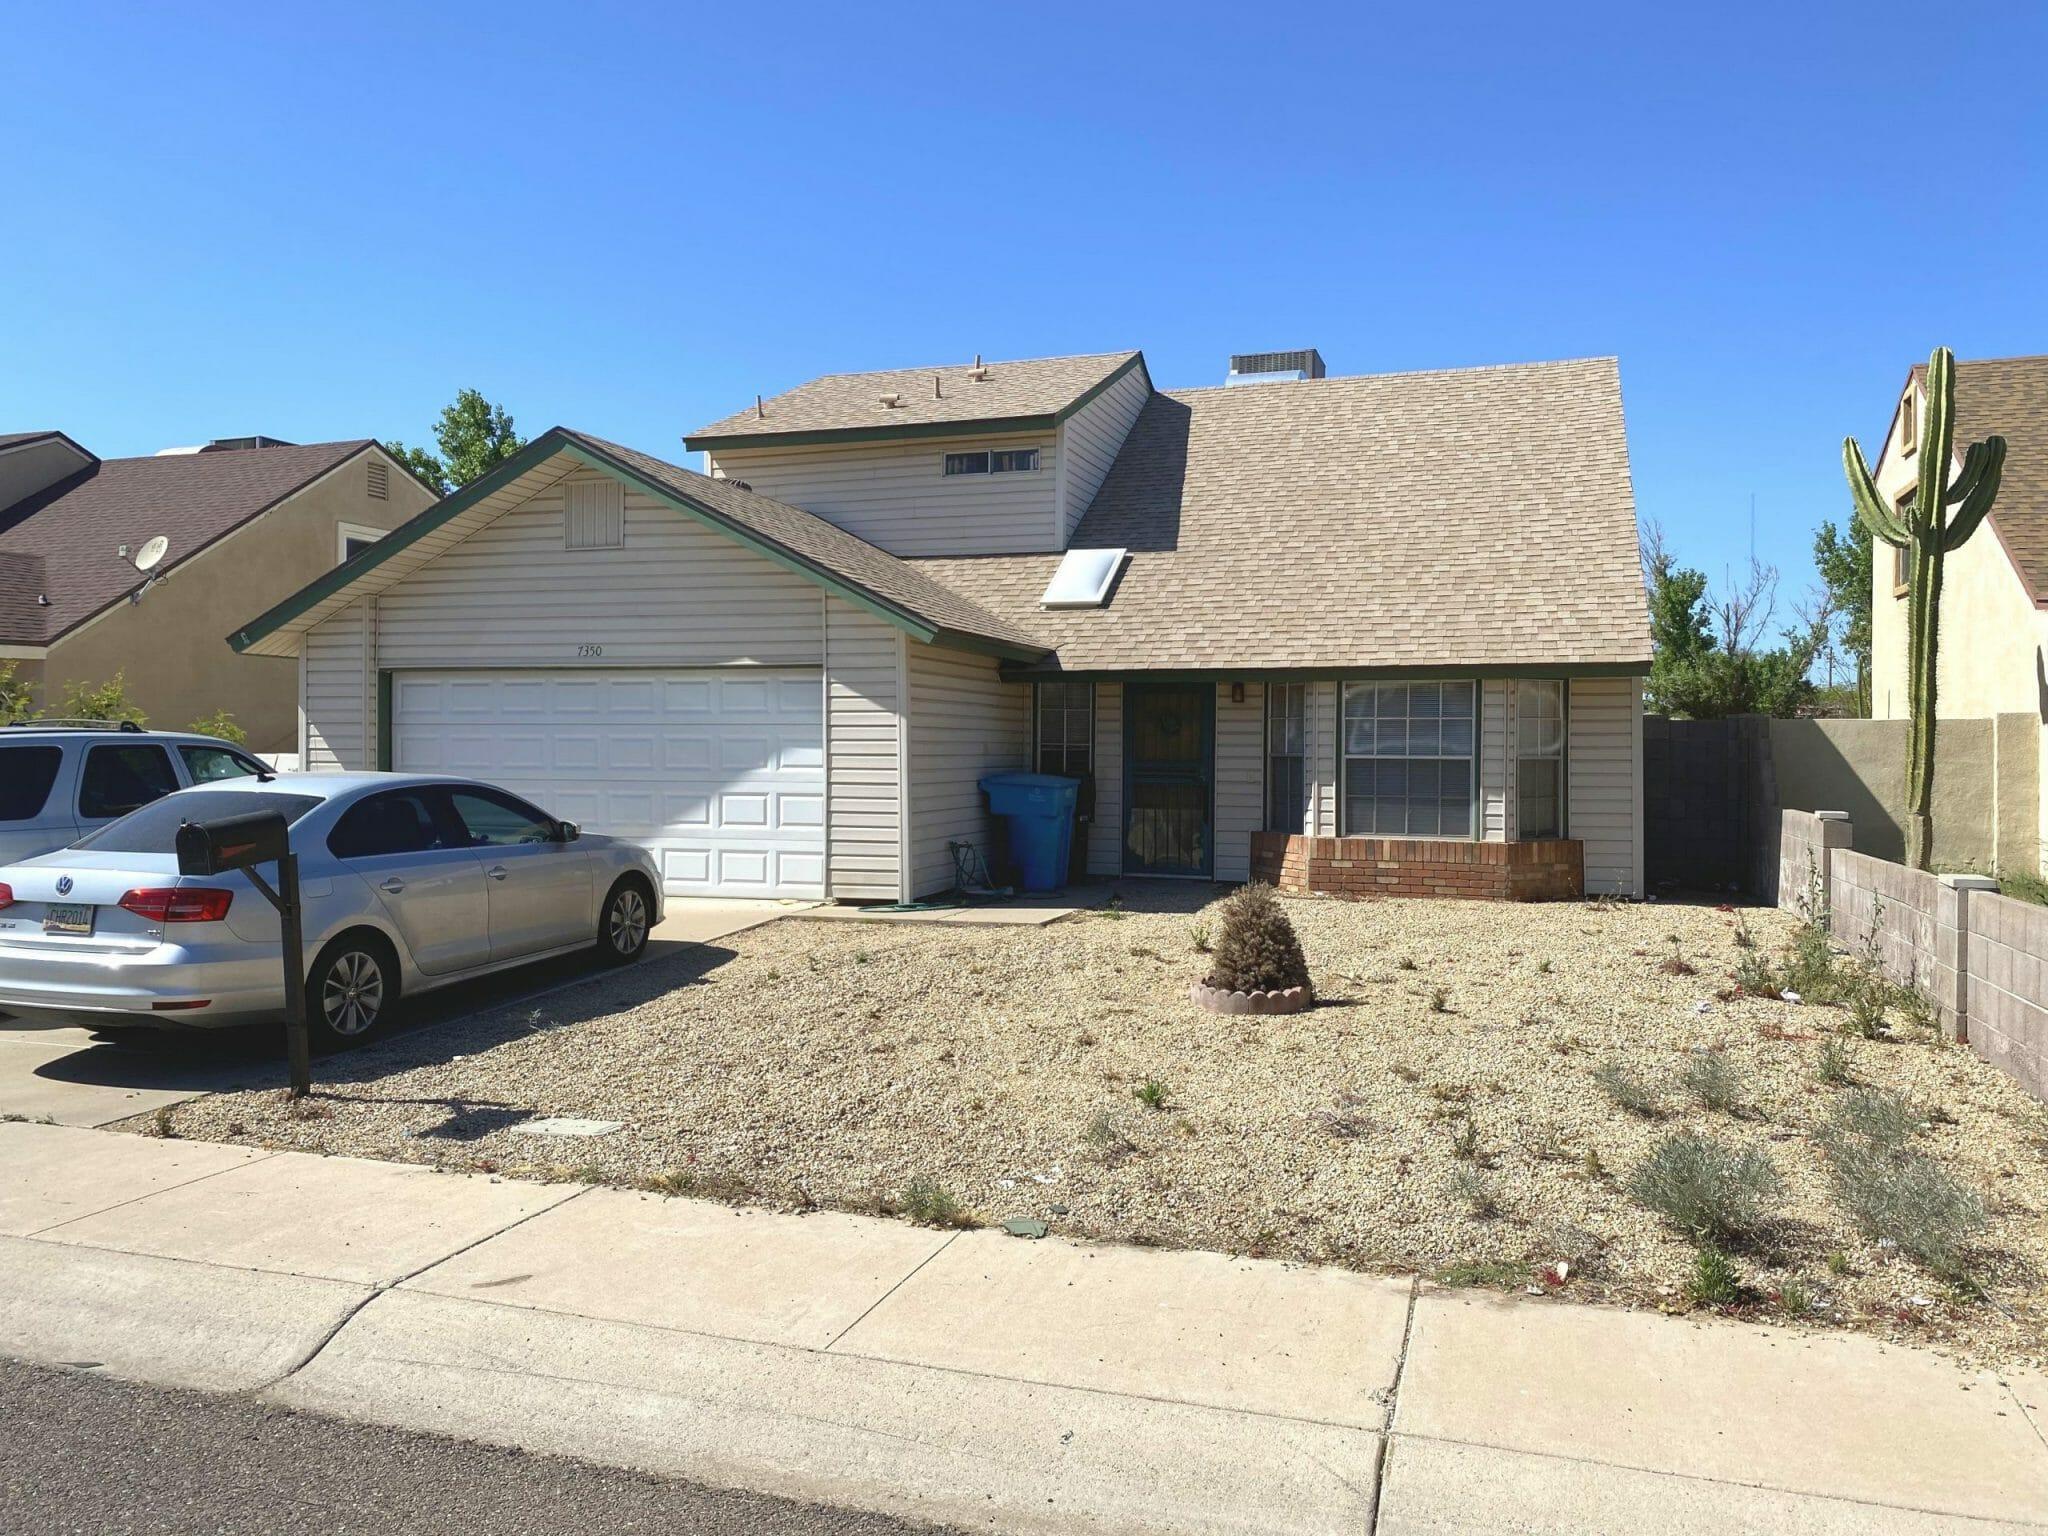 7350 W Coolidge St, Phoenix, AZ 85033